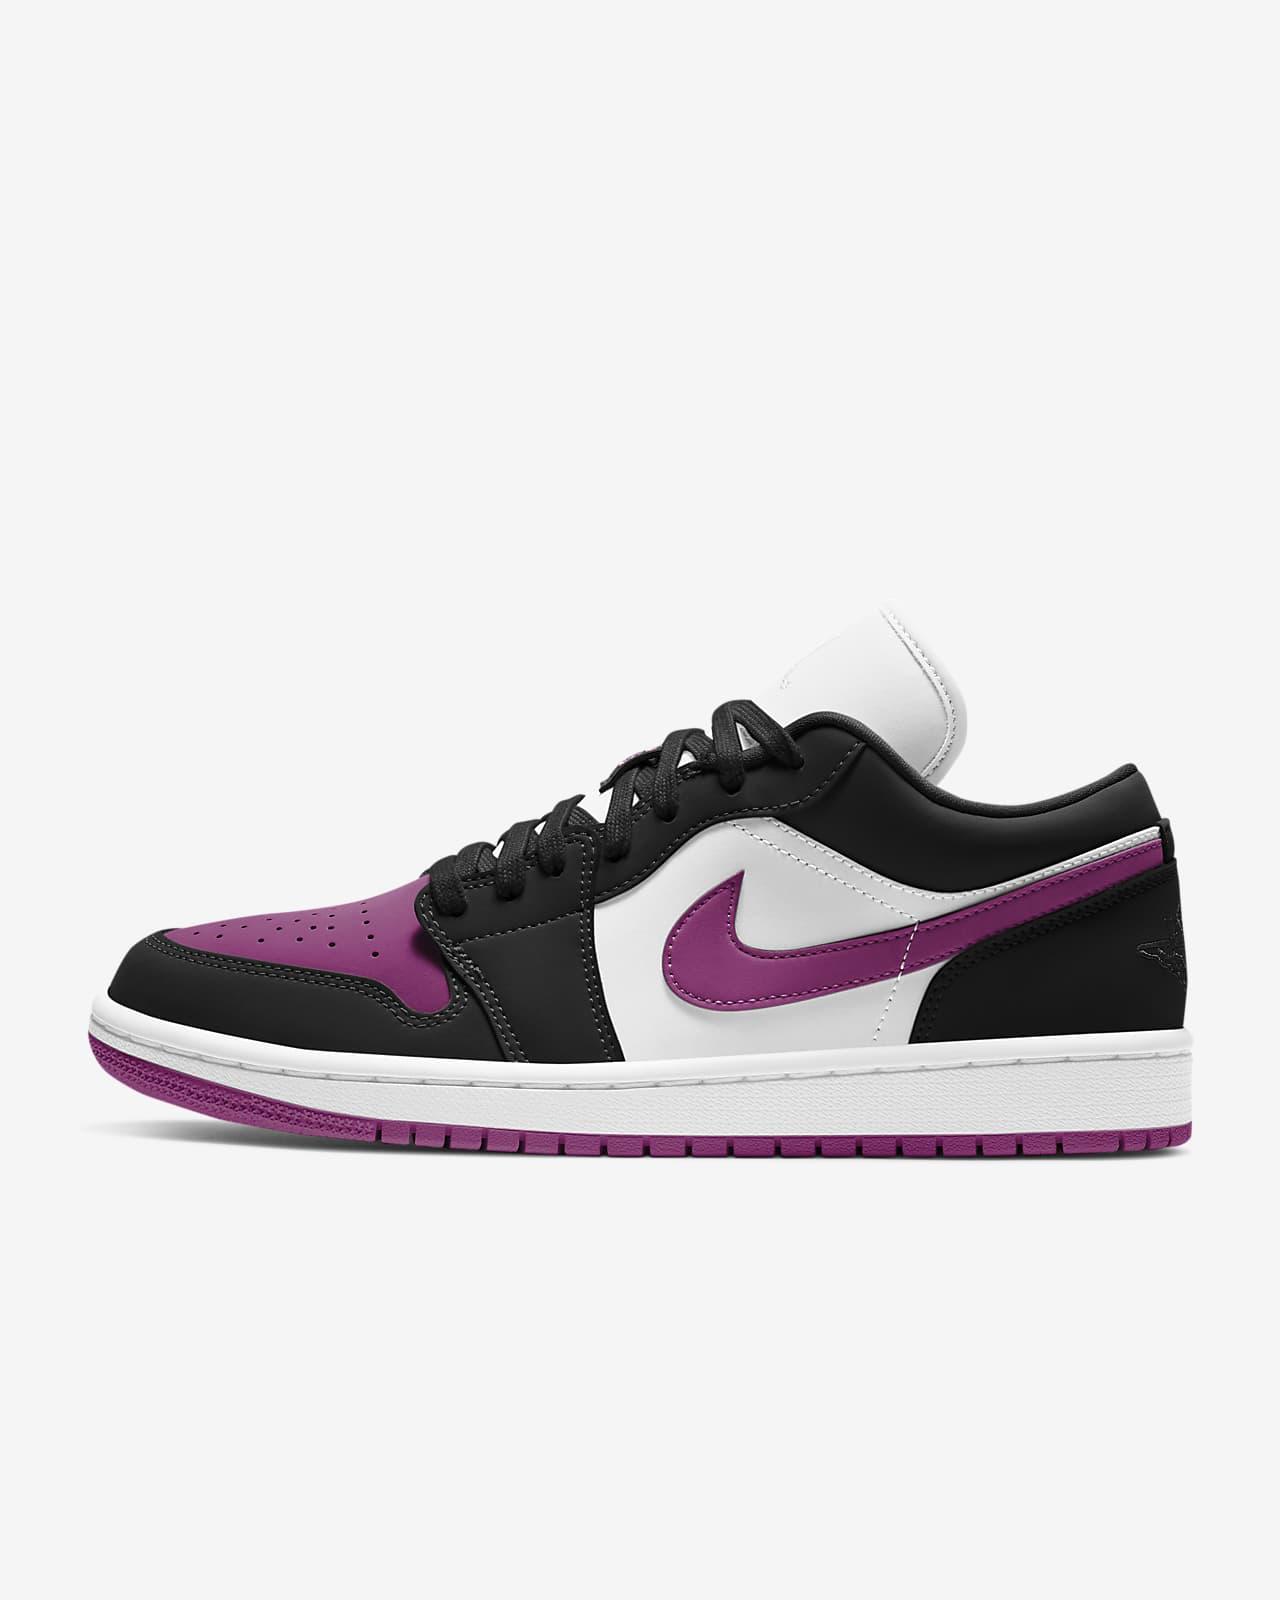 chaussure air jordan 1 femme